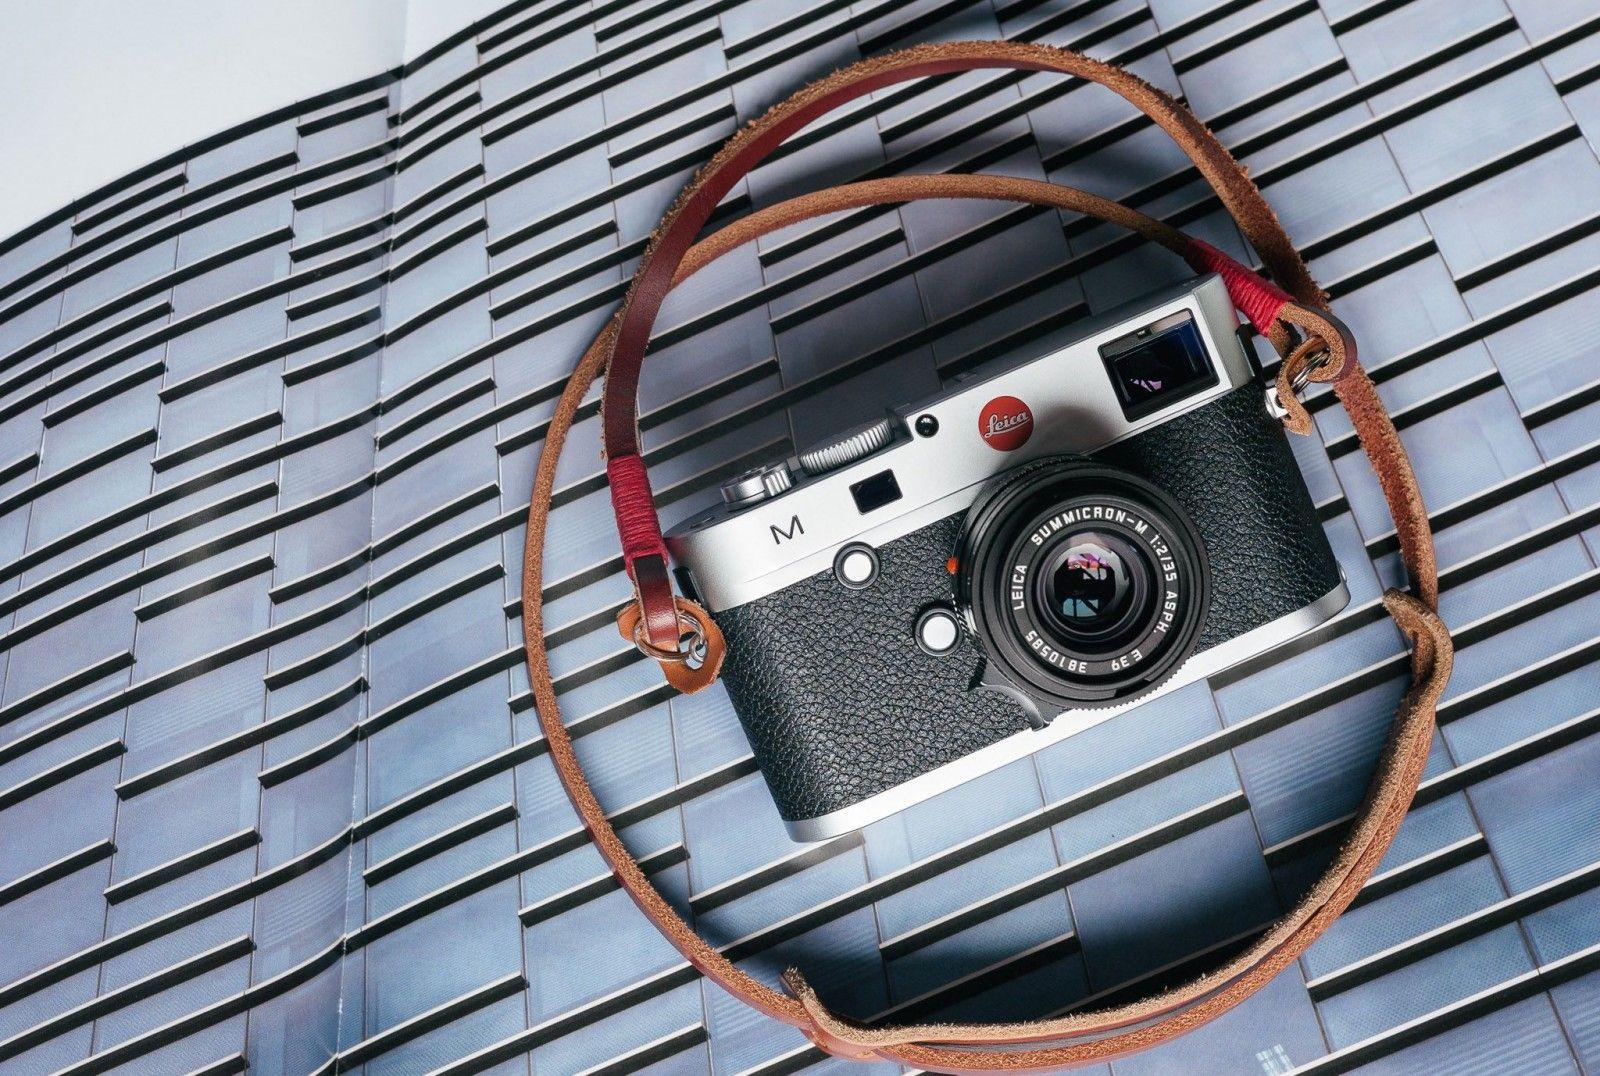 Leica M (Typ 240) Summicron-M 35mm ASPH.